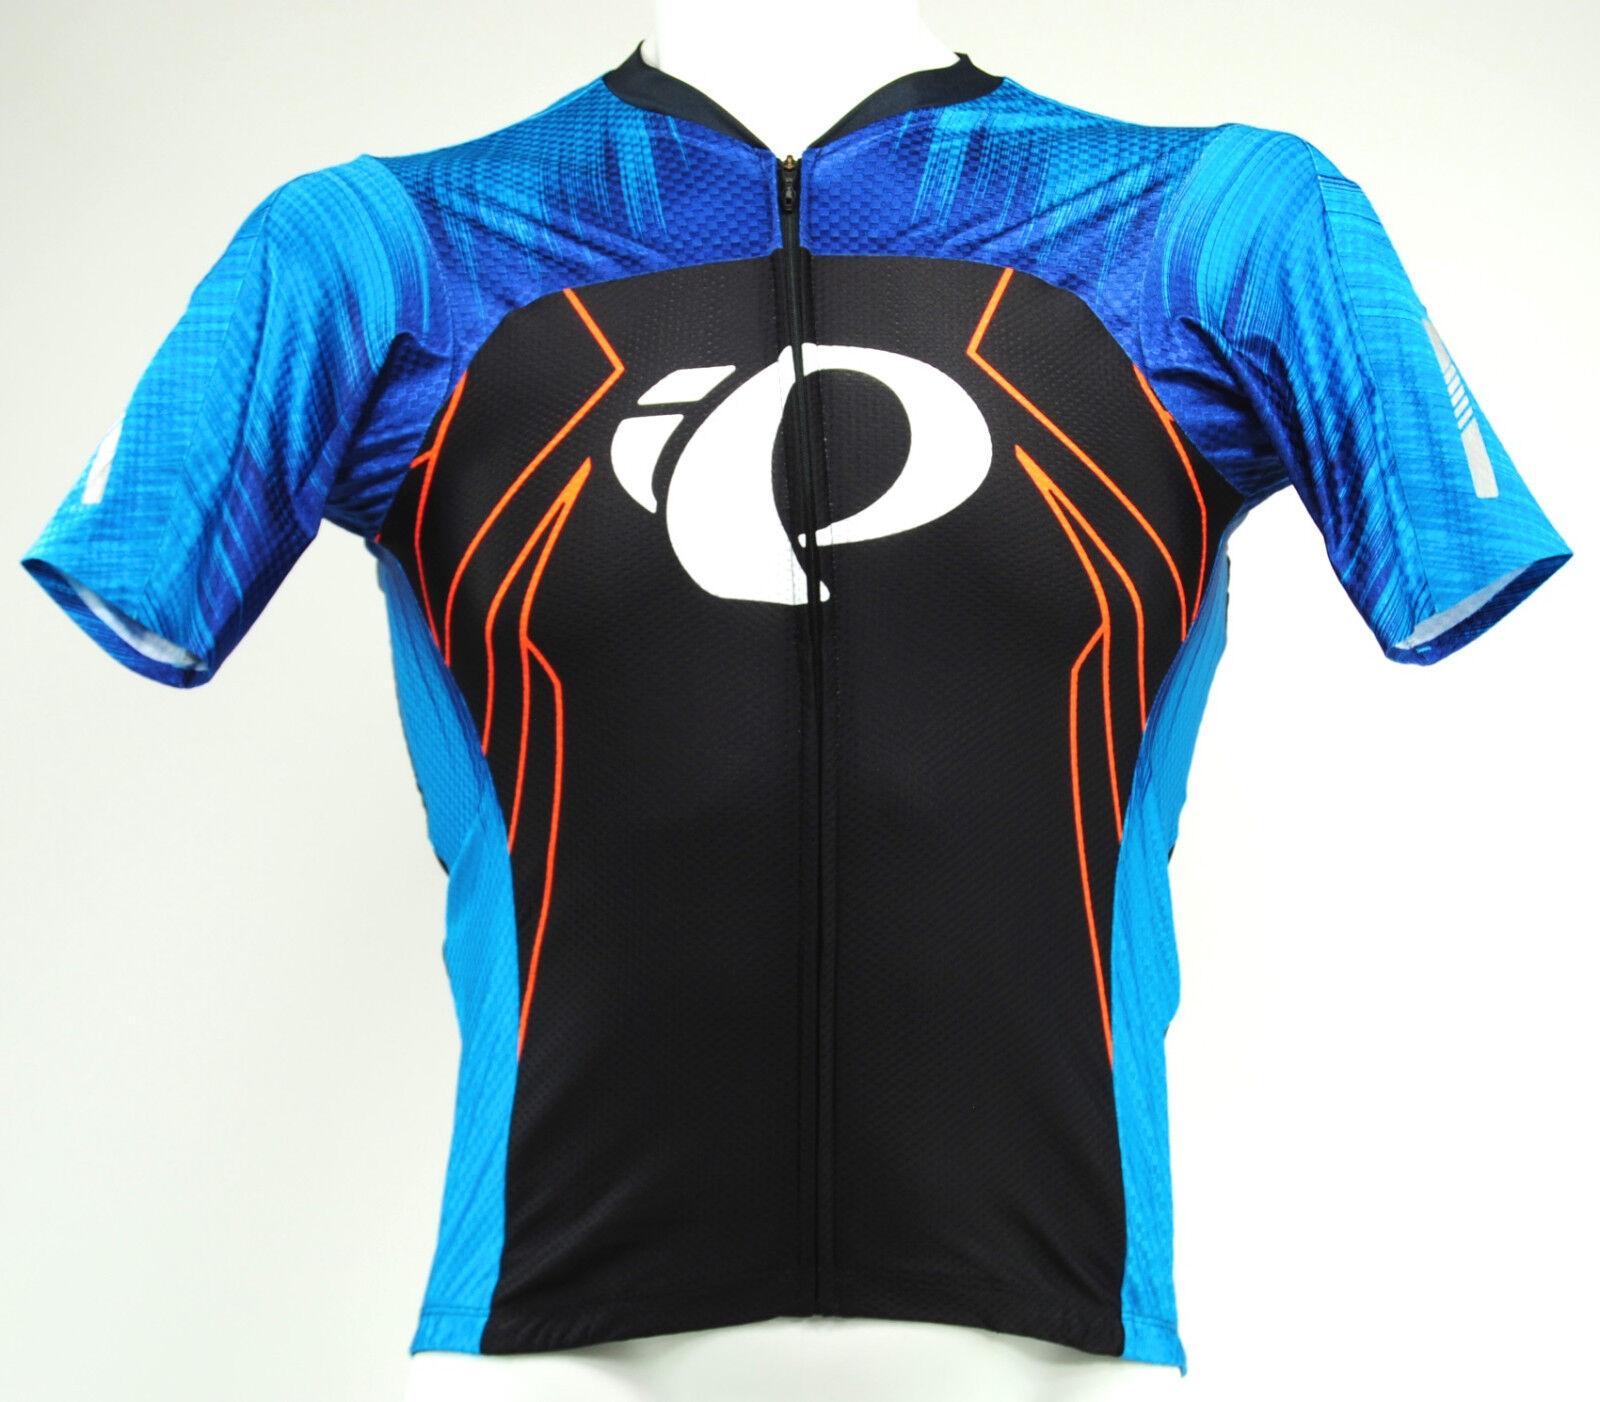 Pearl Izumi 2017 P.R.O. PRO Pursuit Speed Bike Jersey Team Bel Air bluee, Medium